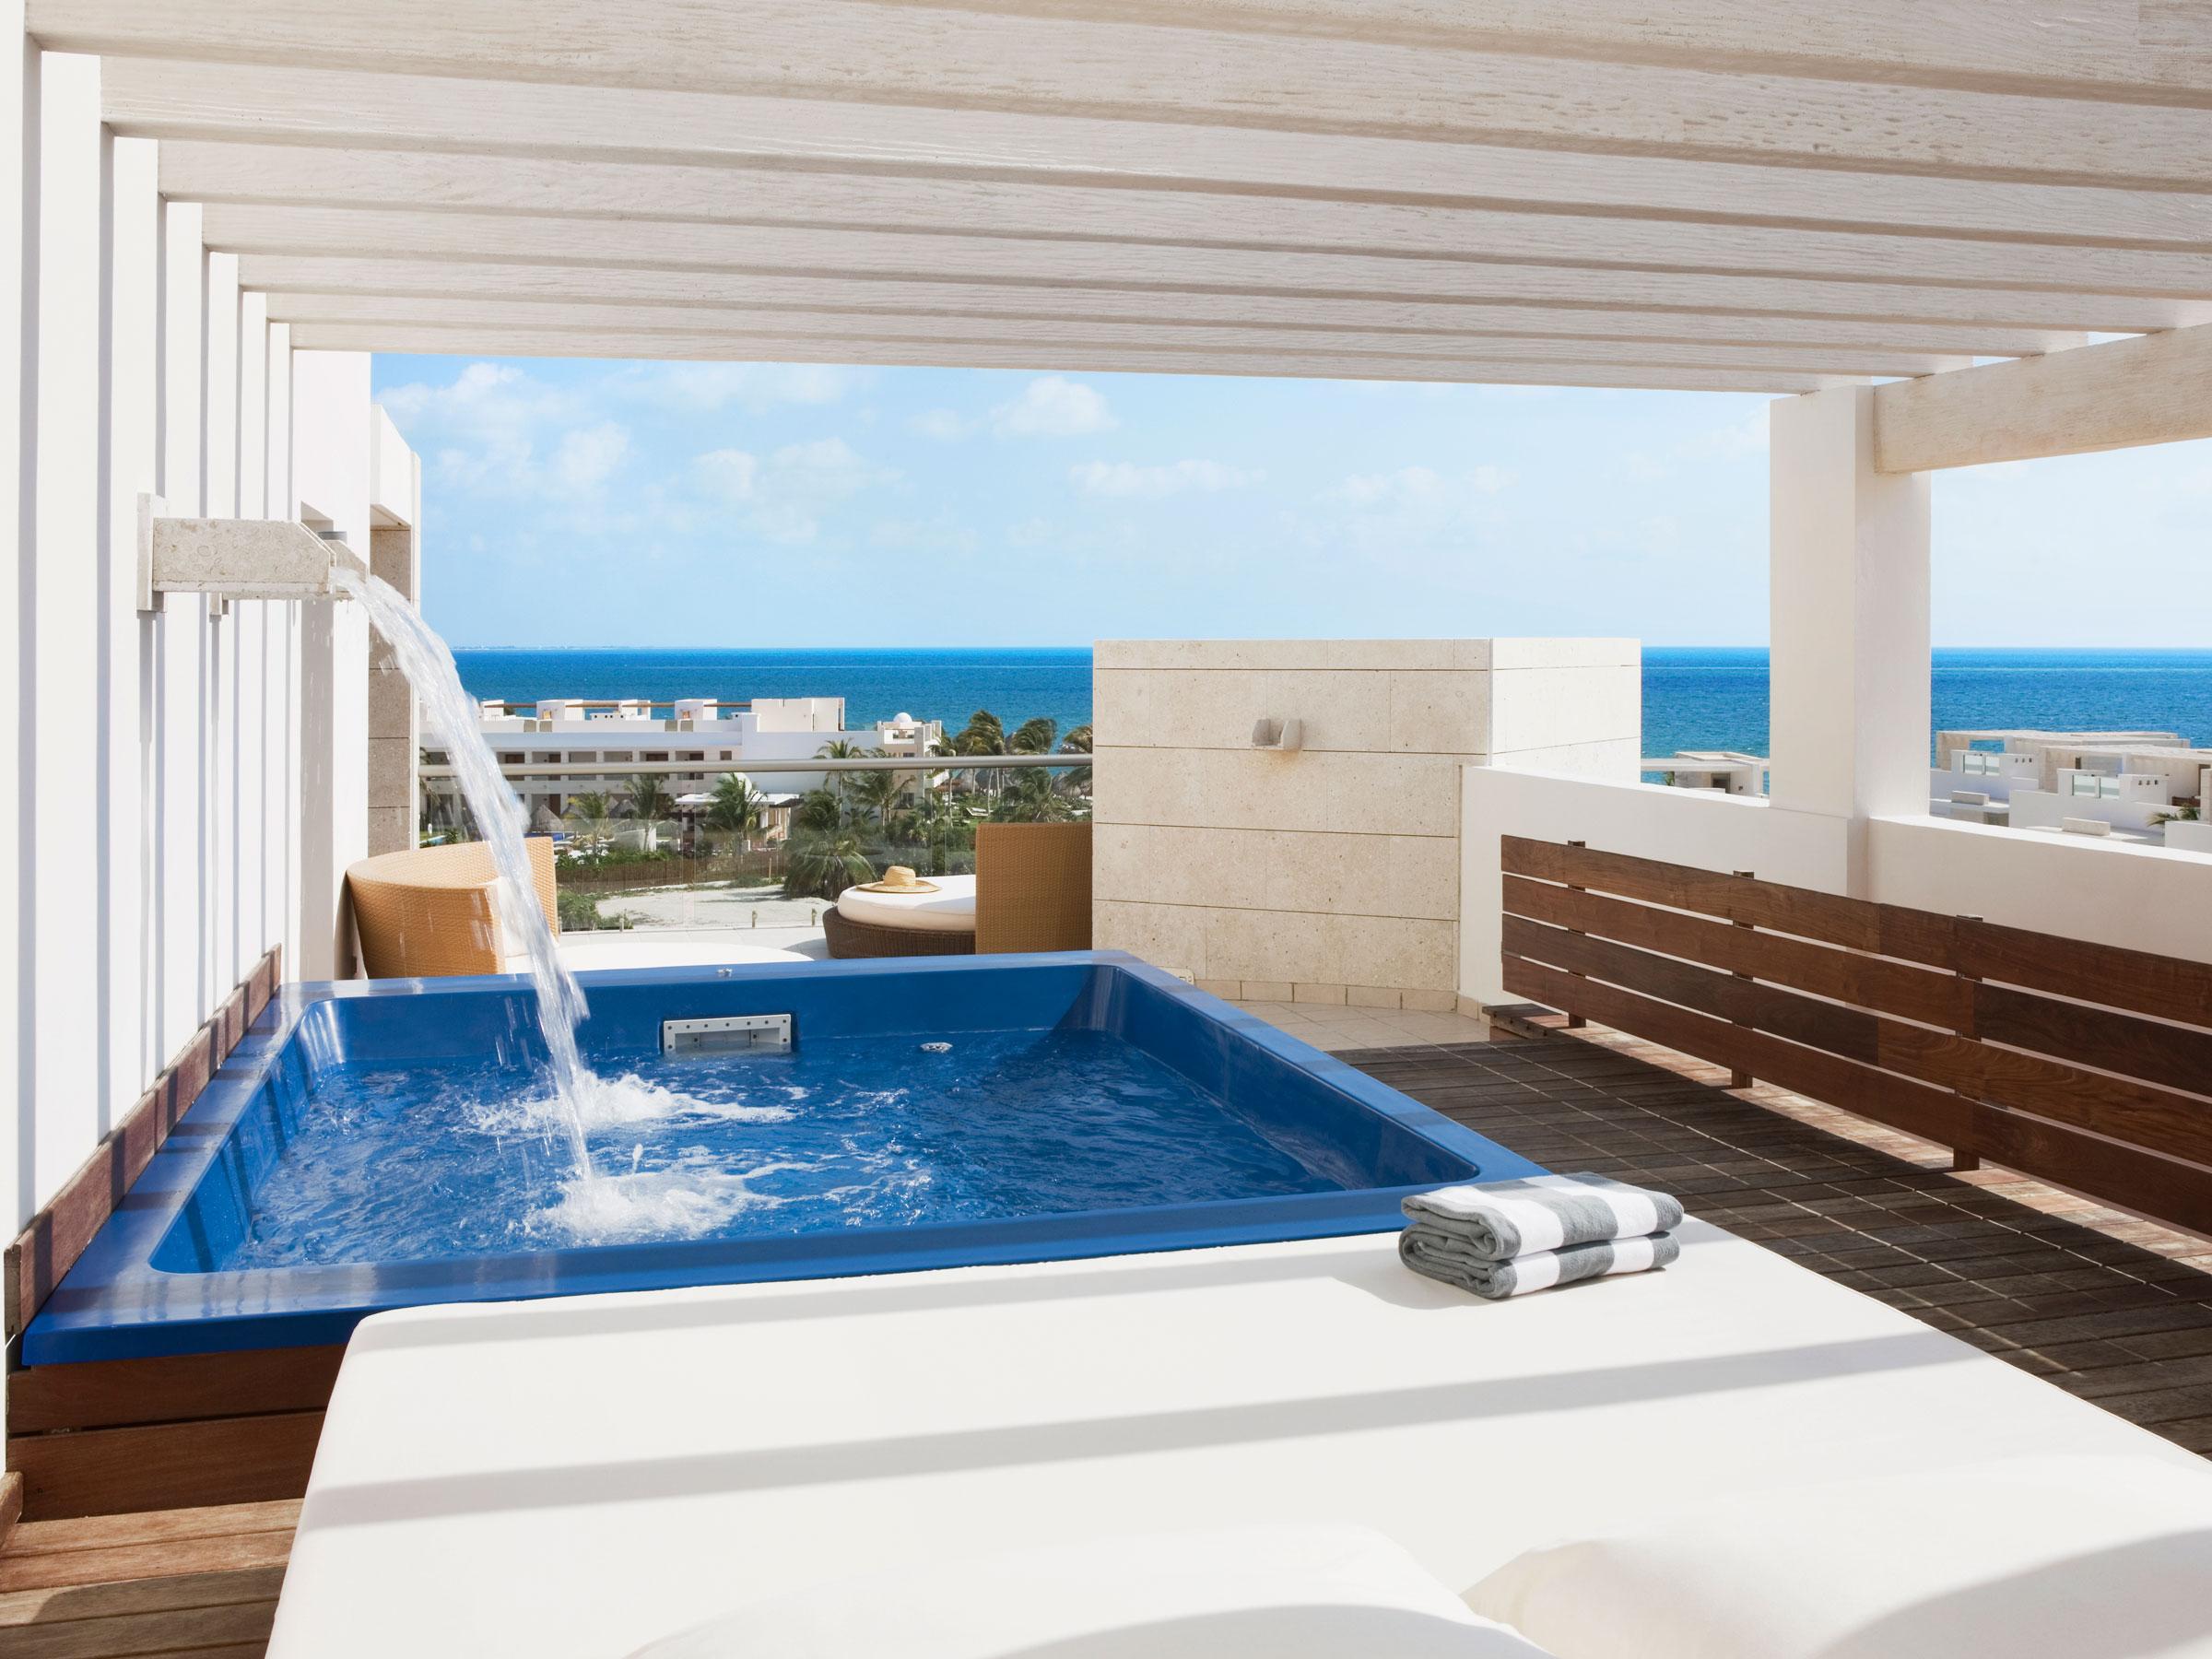 Suite Avec Terrasse Et Bassin De Plongeon | Suites | Beloved ... encequiconcerne Hotel Piscine Privée